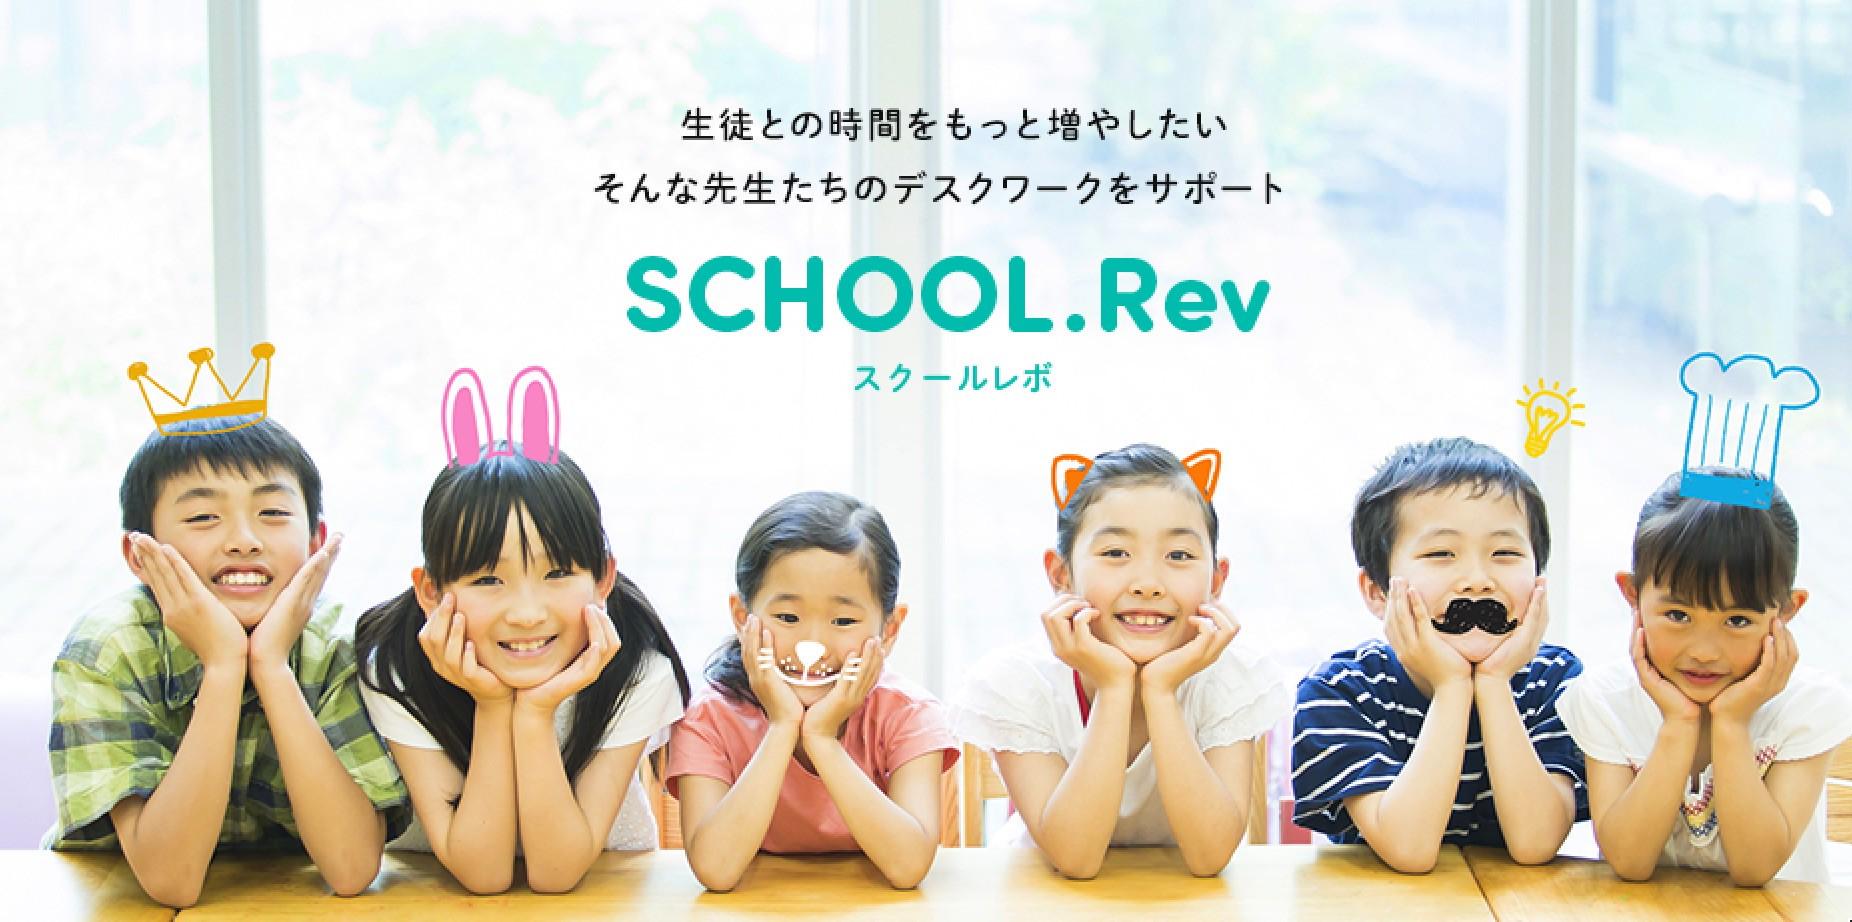 schoolrev